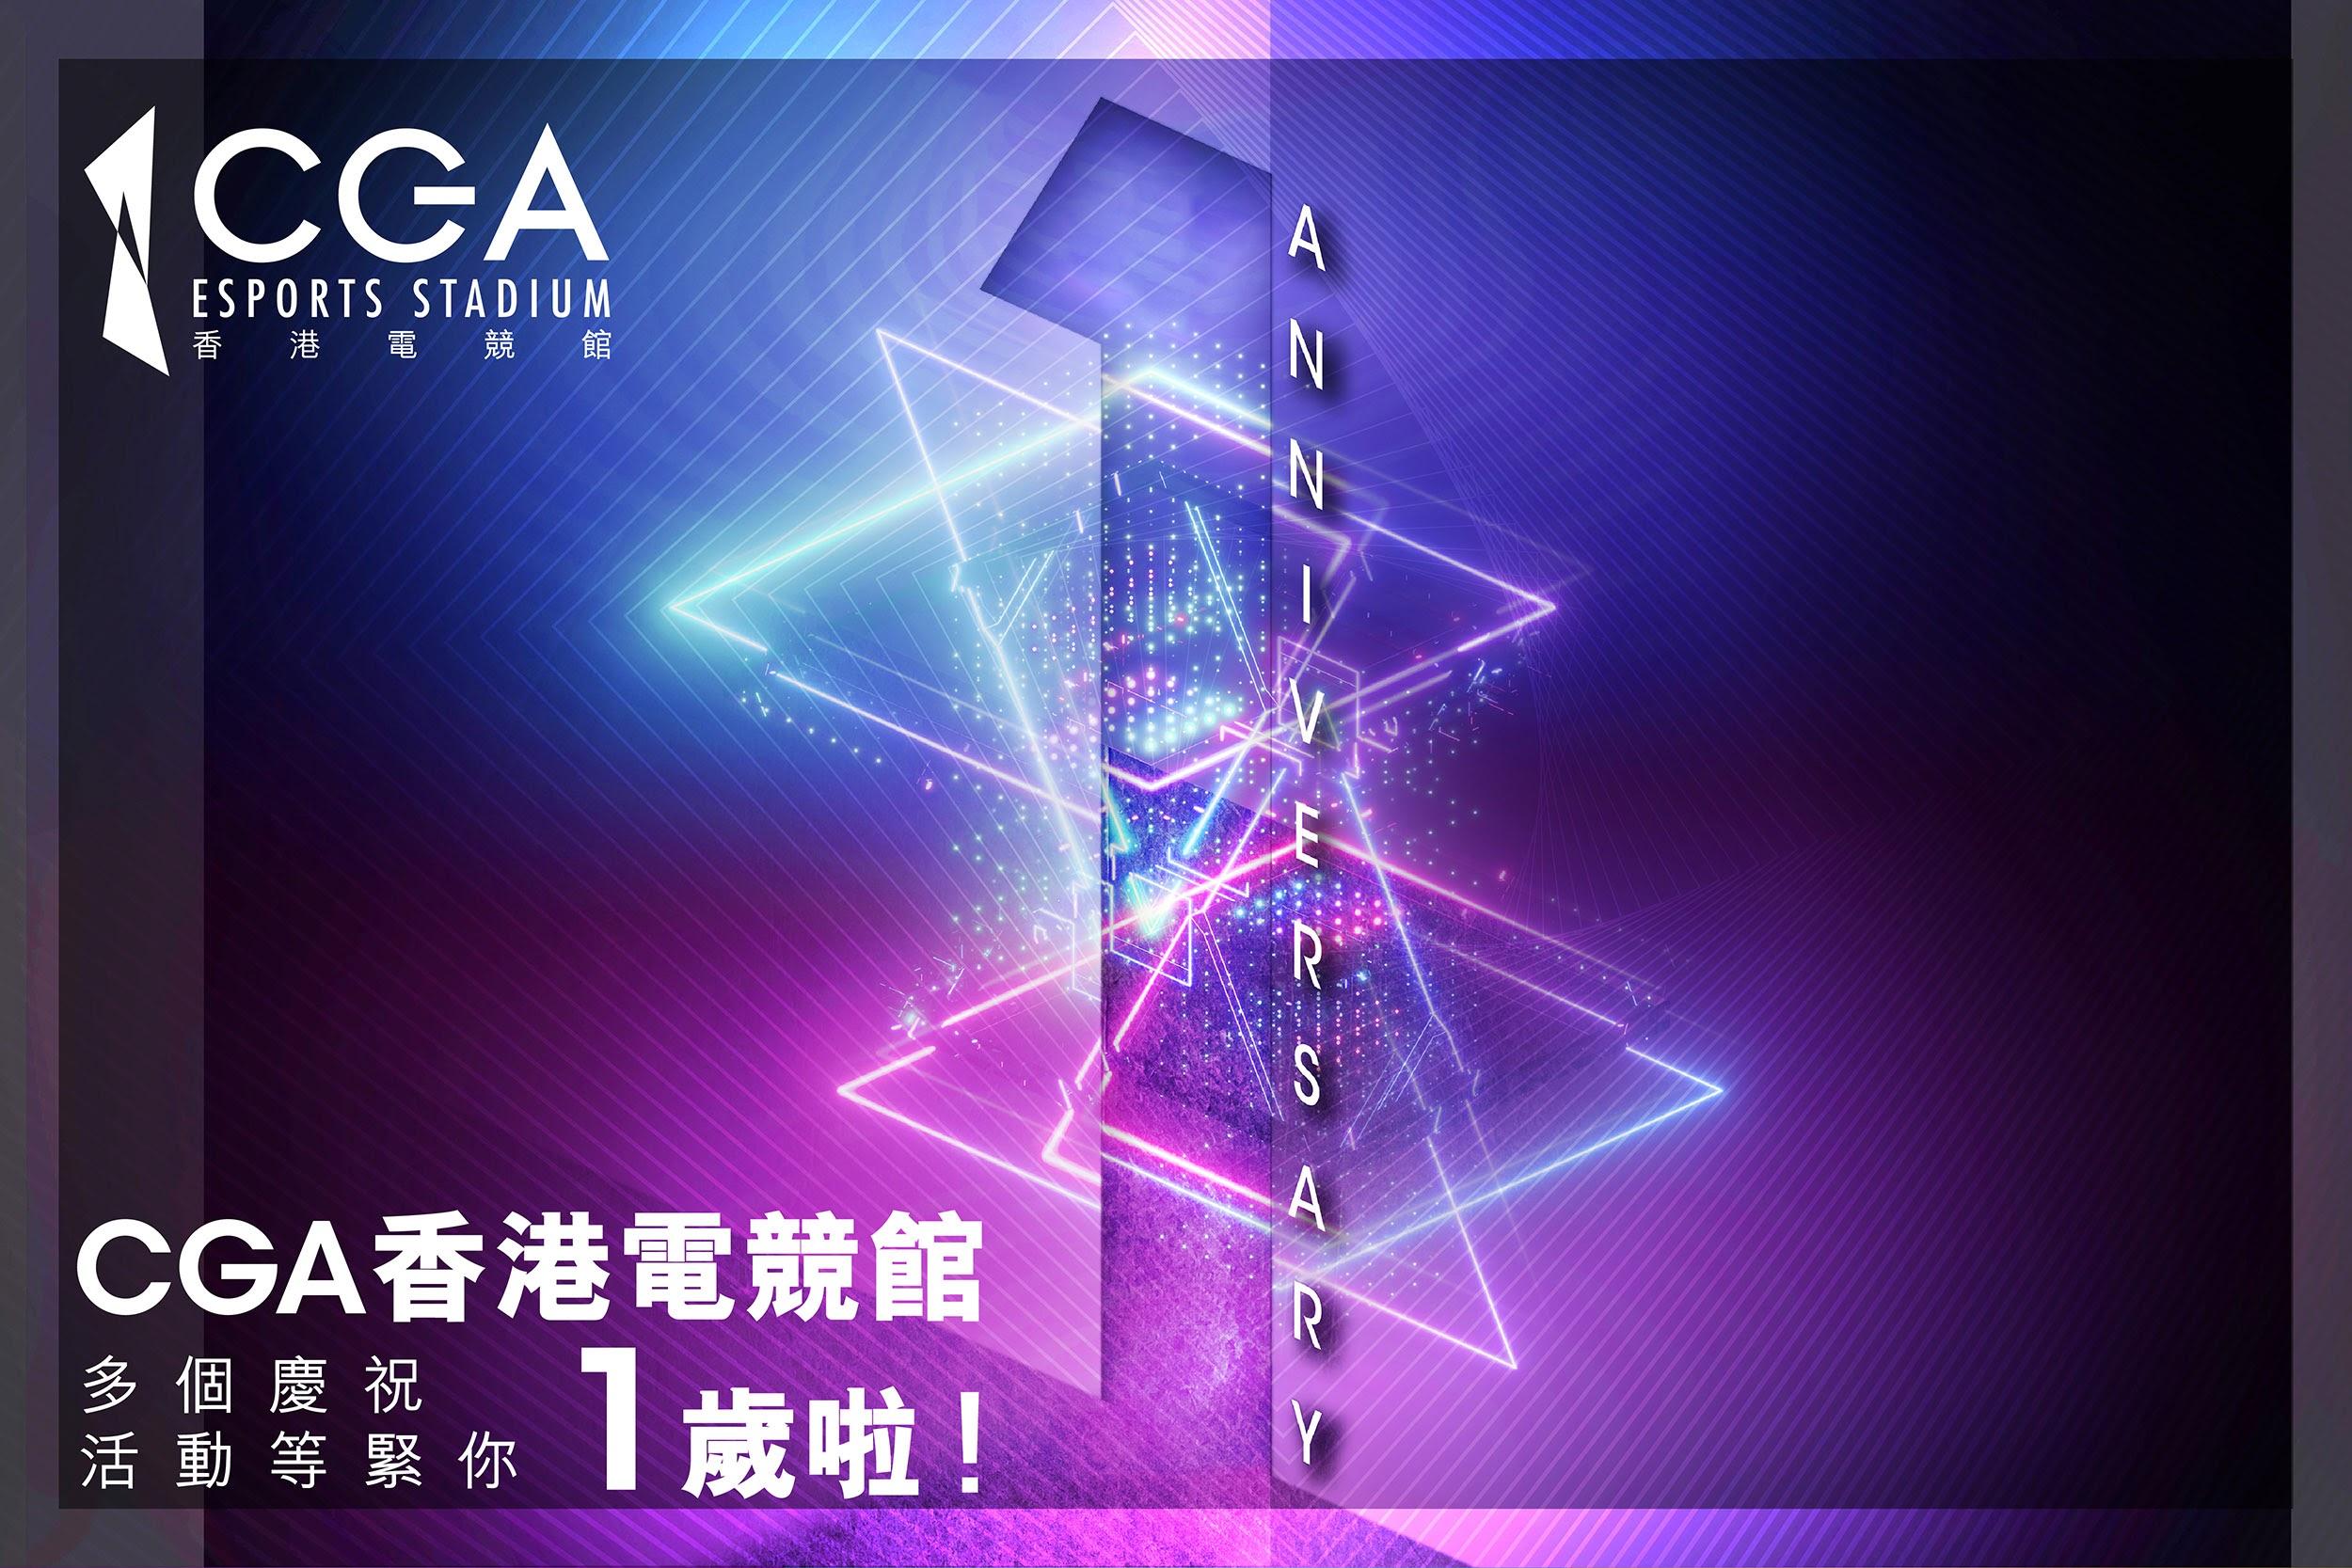 「CGA 香港電競館」1歲生日  推出一籮籮優惠活動